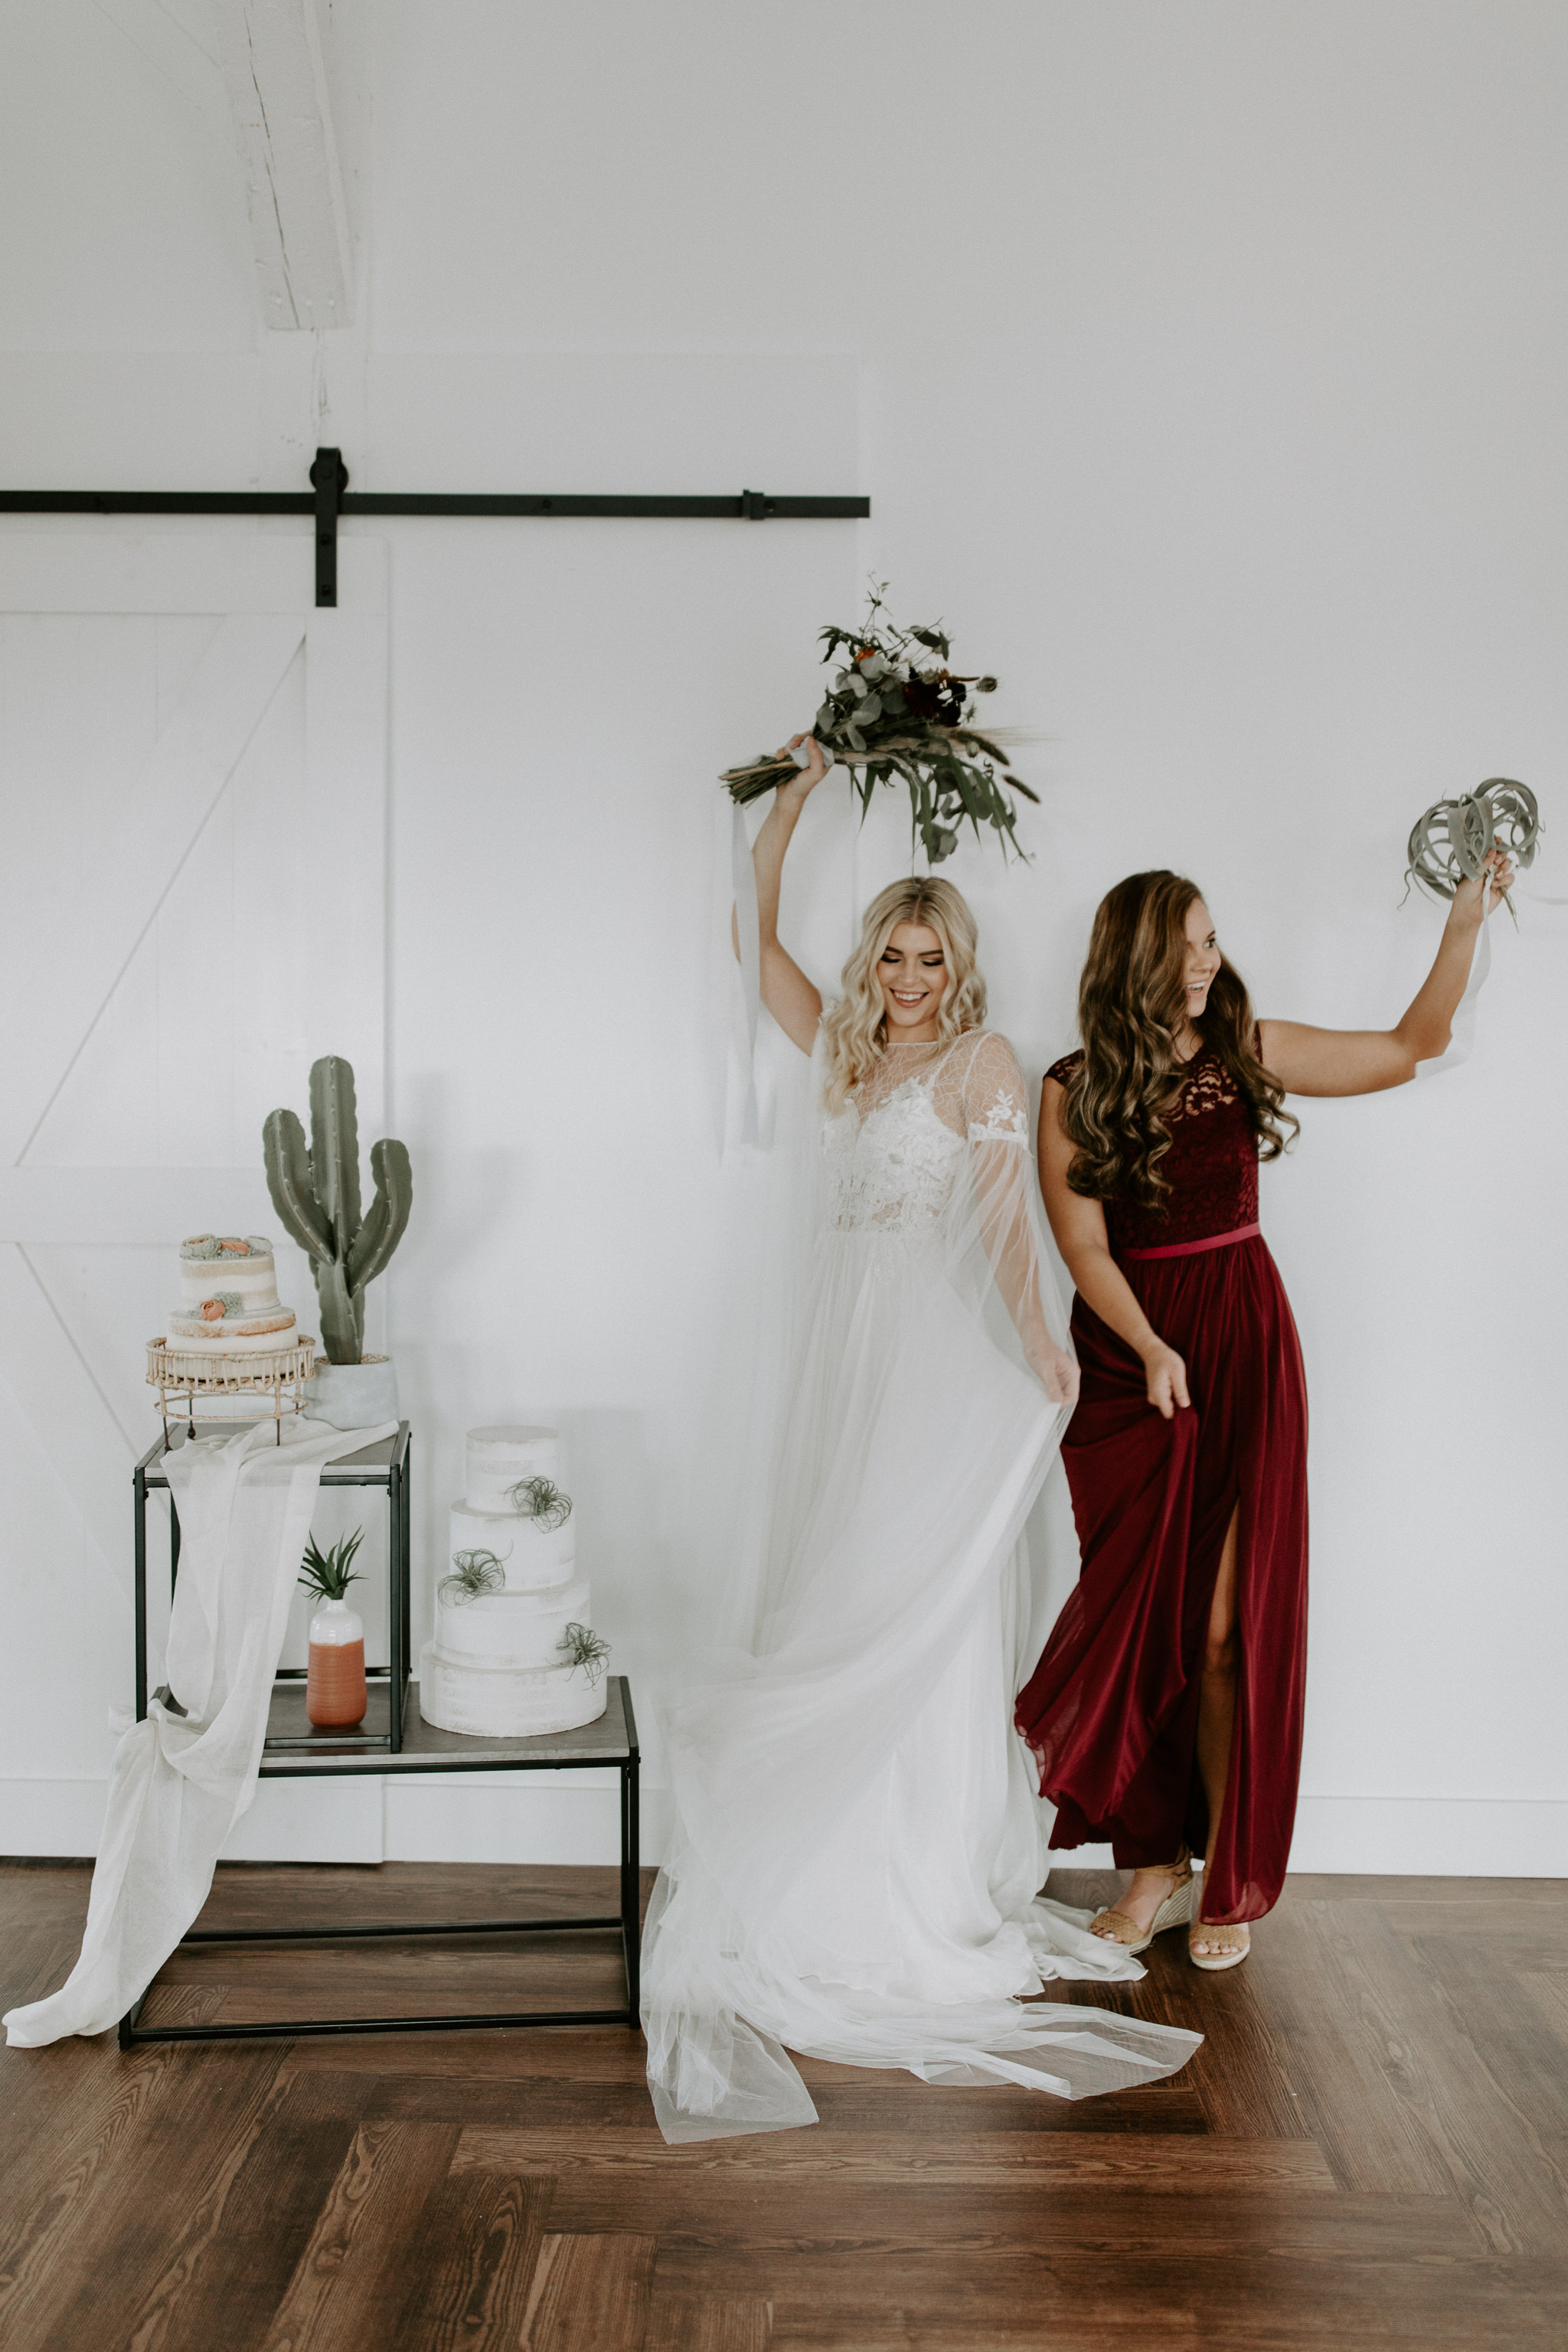 Modern, white wall bride and bridesmaid photo